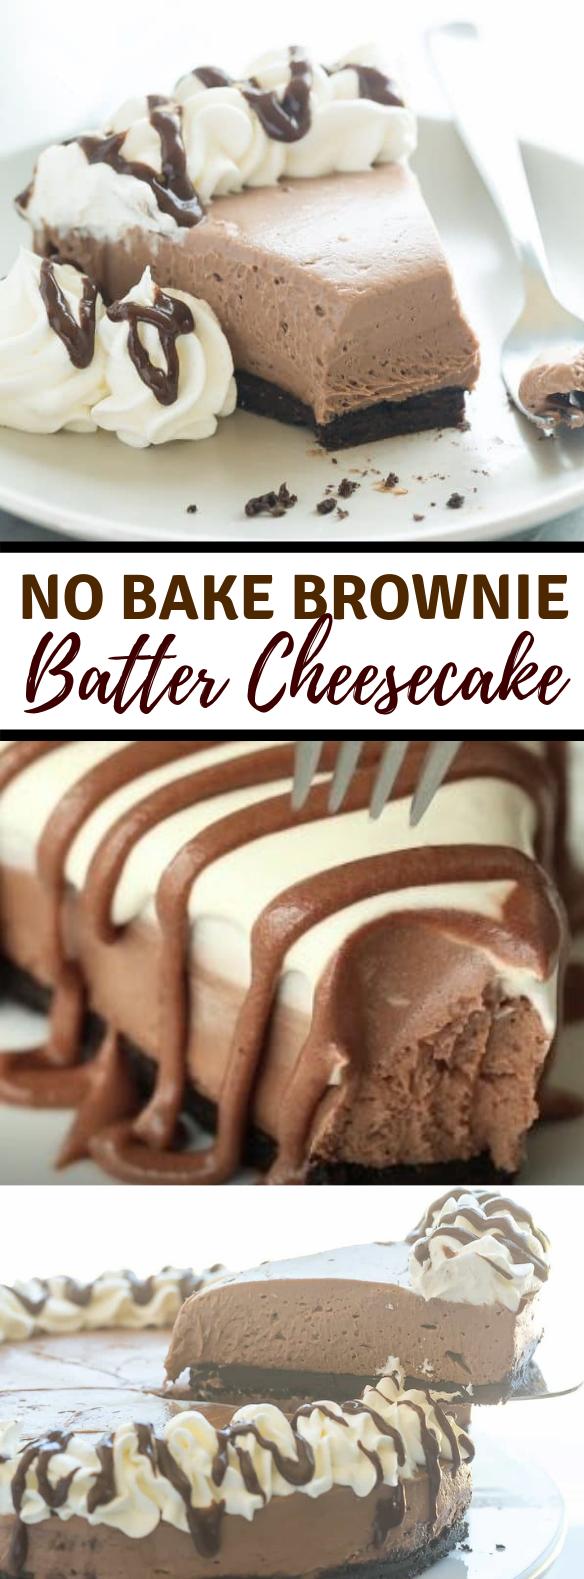 NO BAKE BROWNIE BATTER CHEESECAKE RECIPE #chocolate #desserts